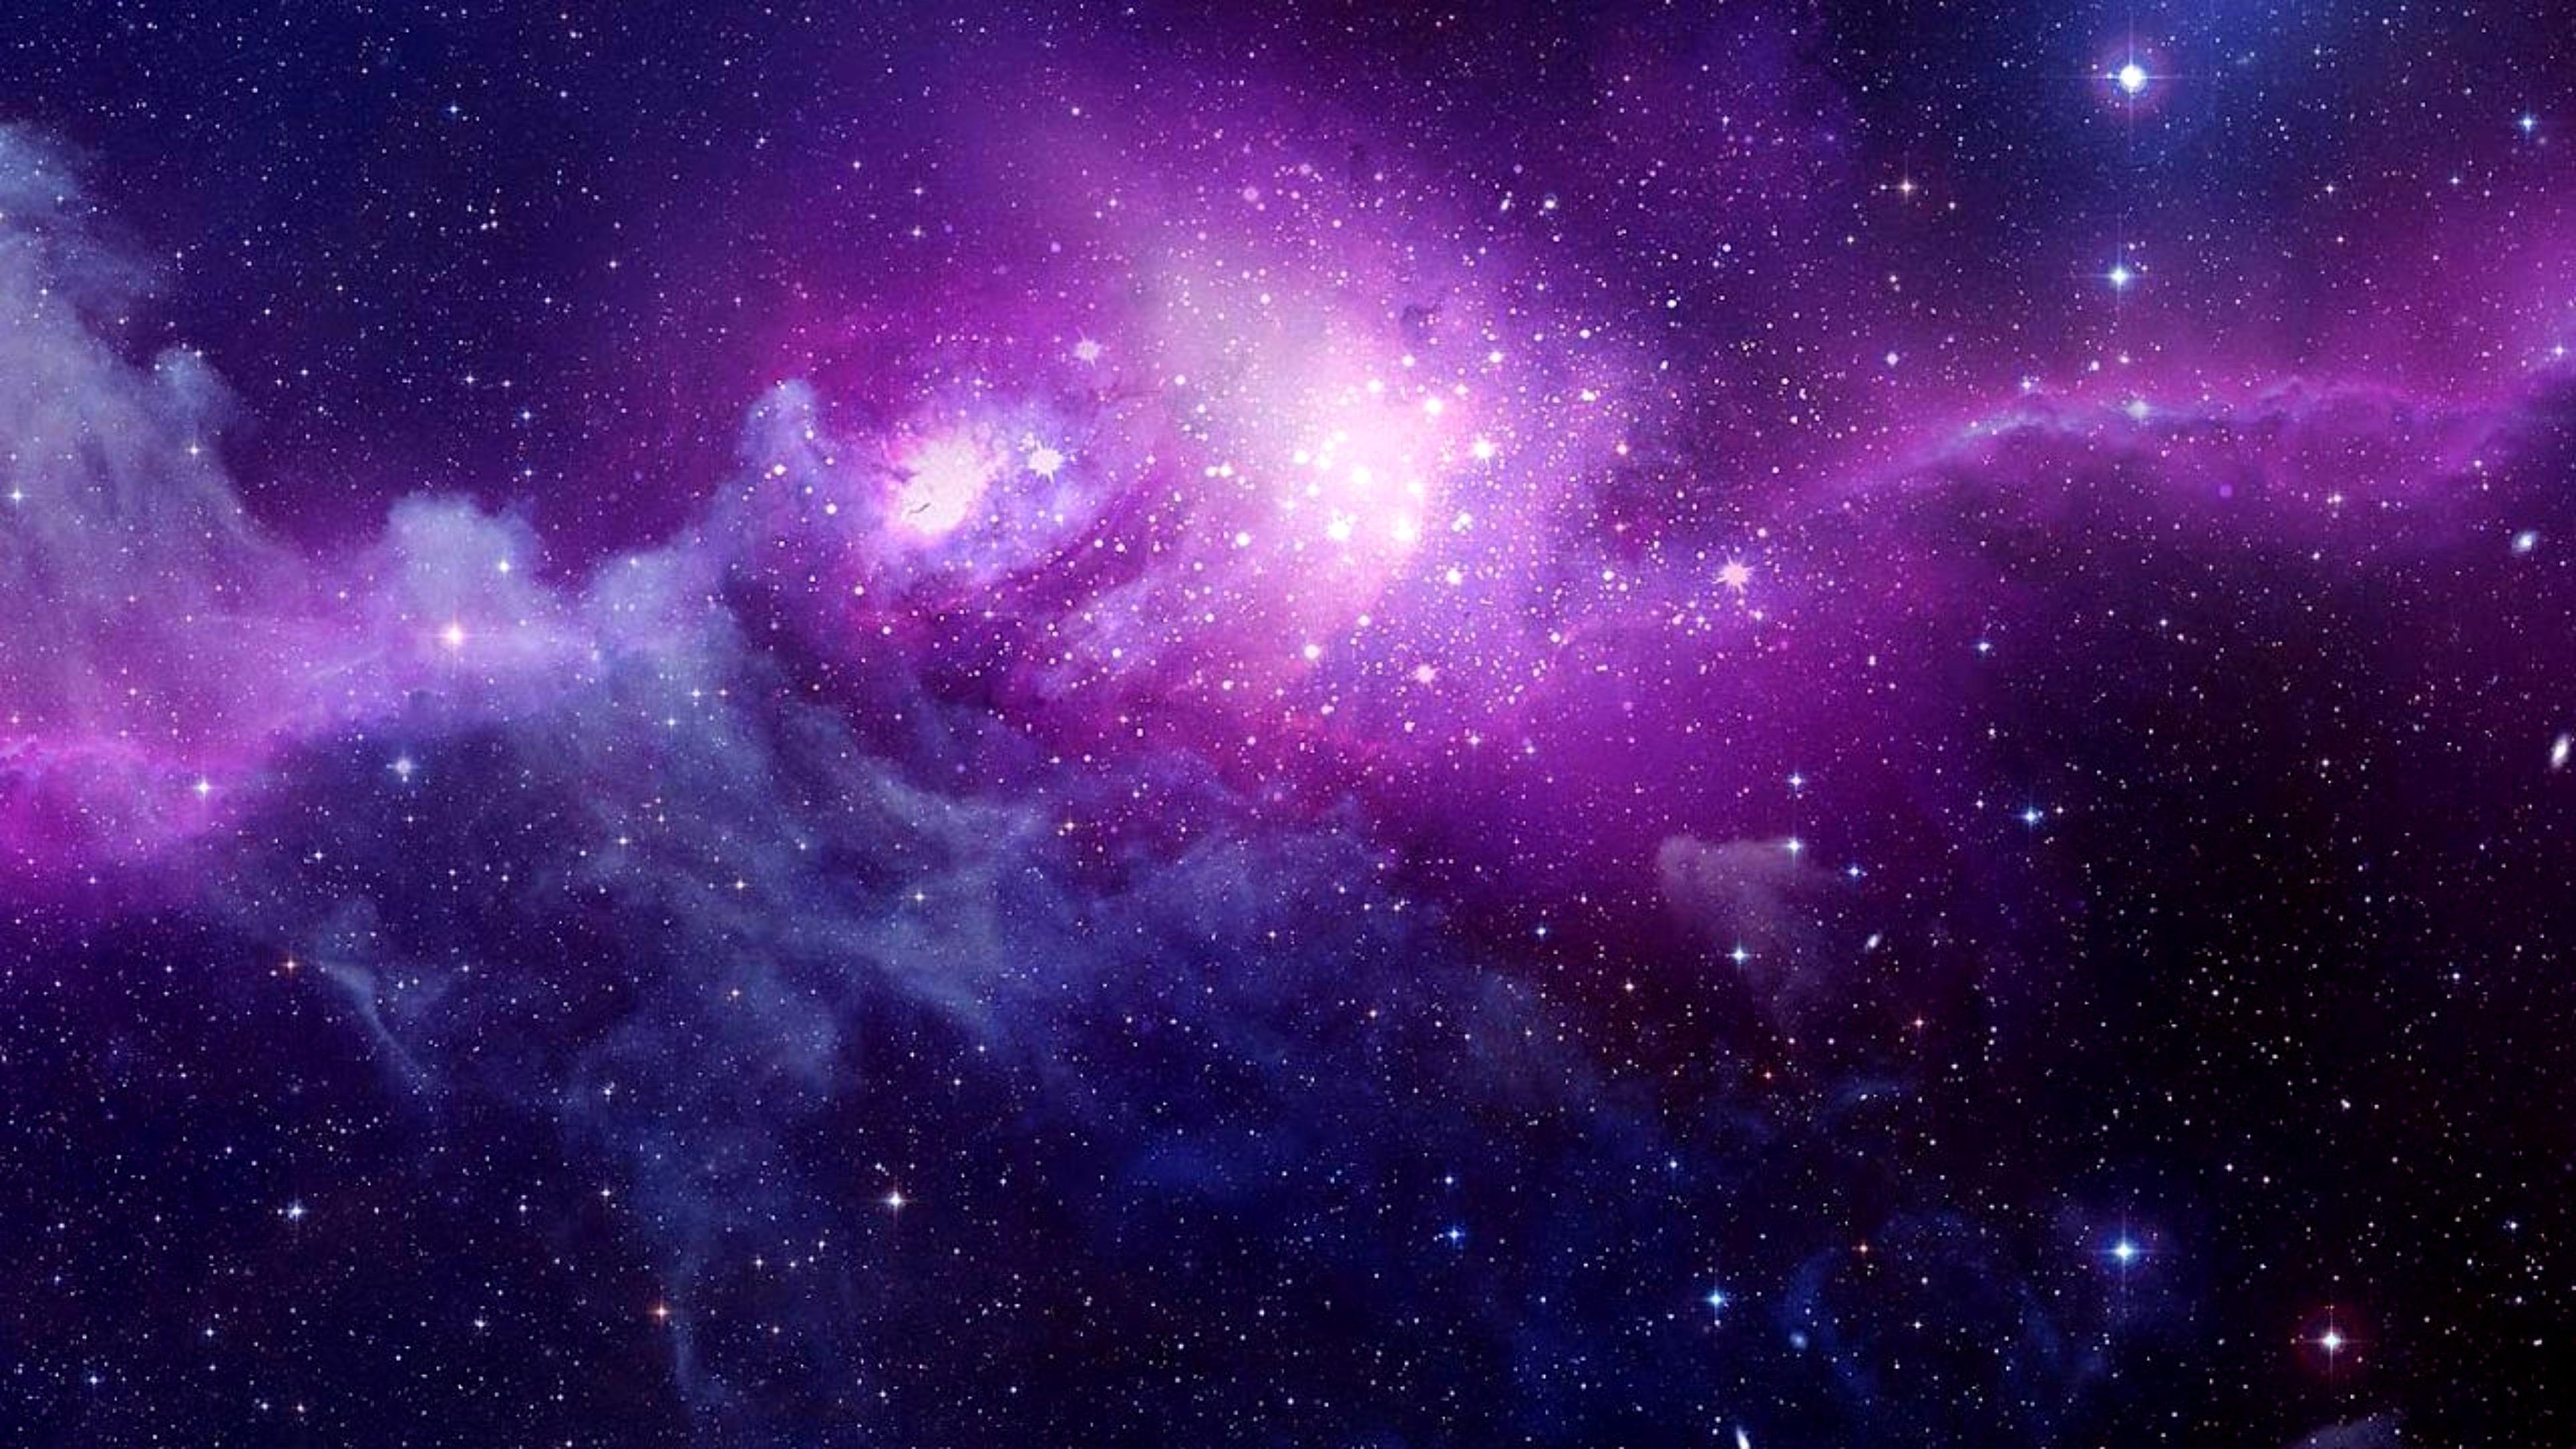 Space Wallpaper 4k Windows 10 Gallery Resim Duvari Arkaplan Tasarimlari Bilgisayar